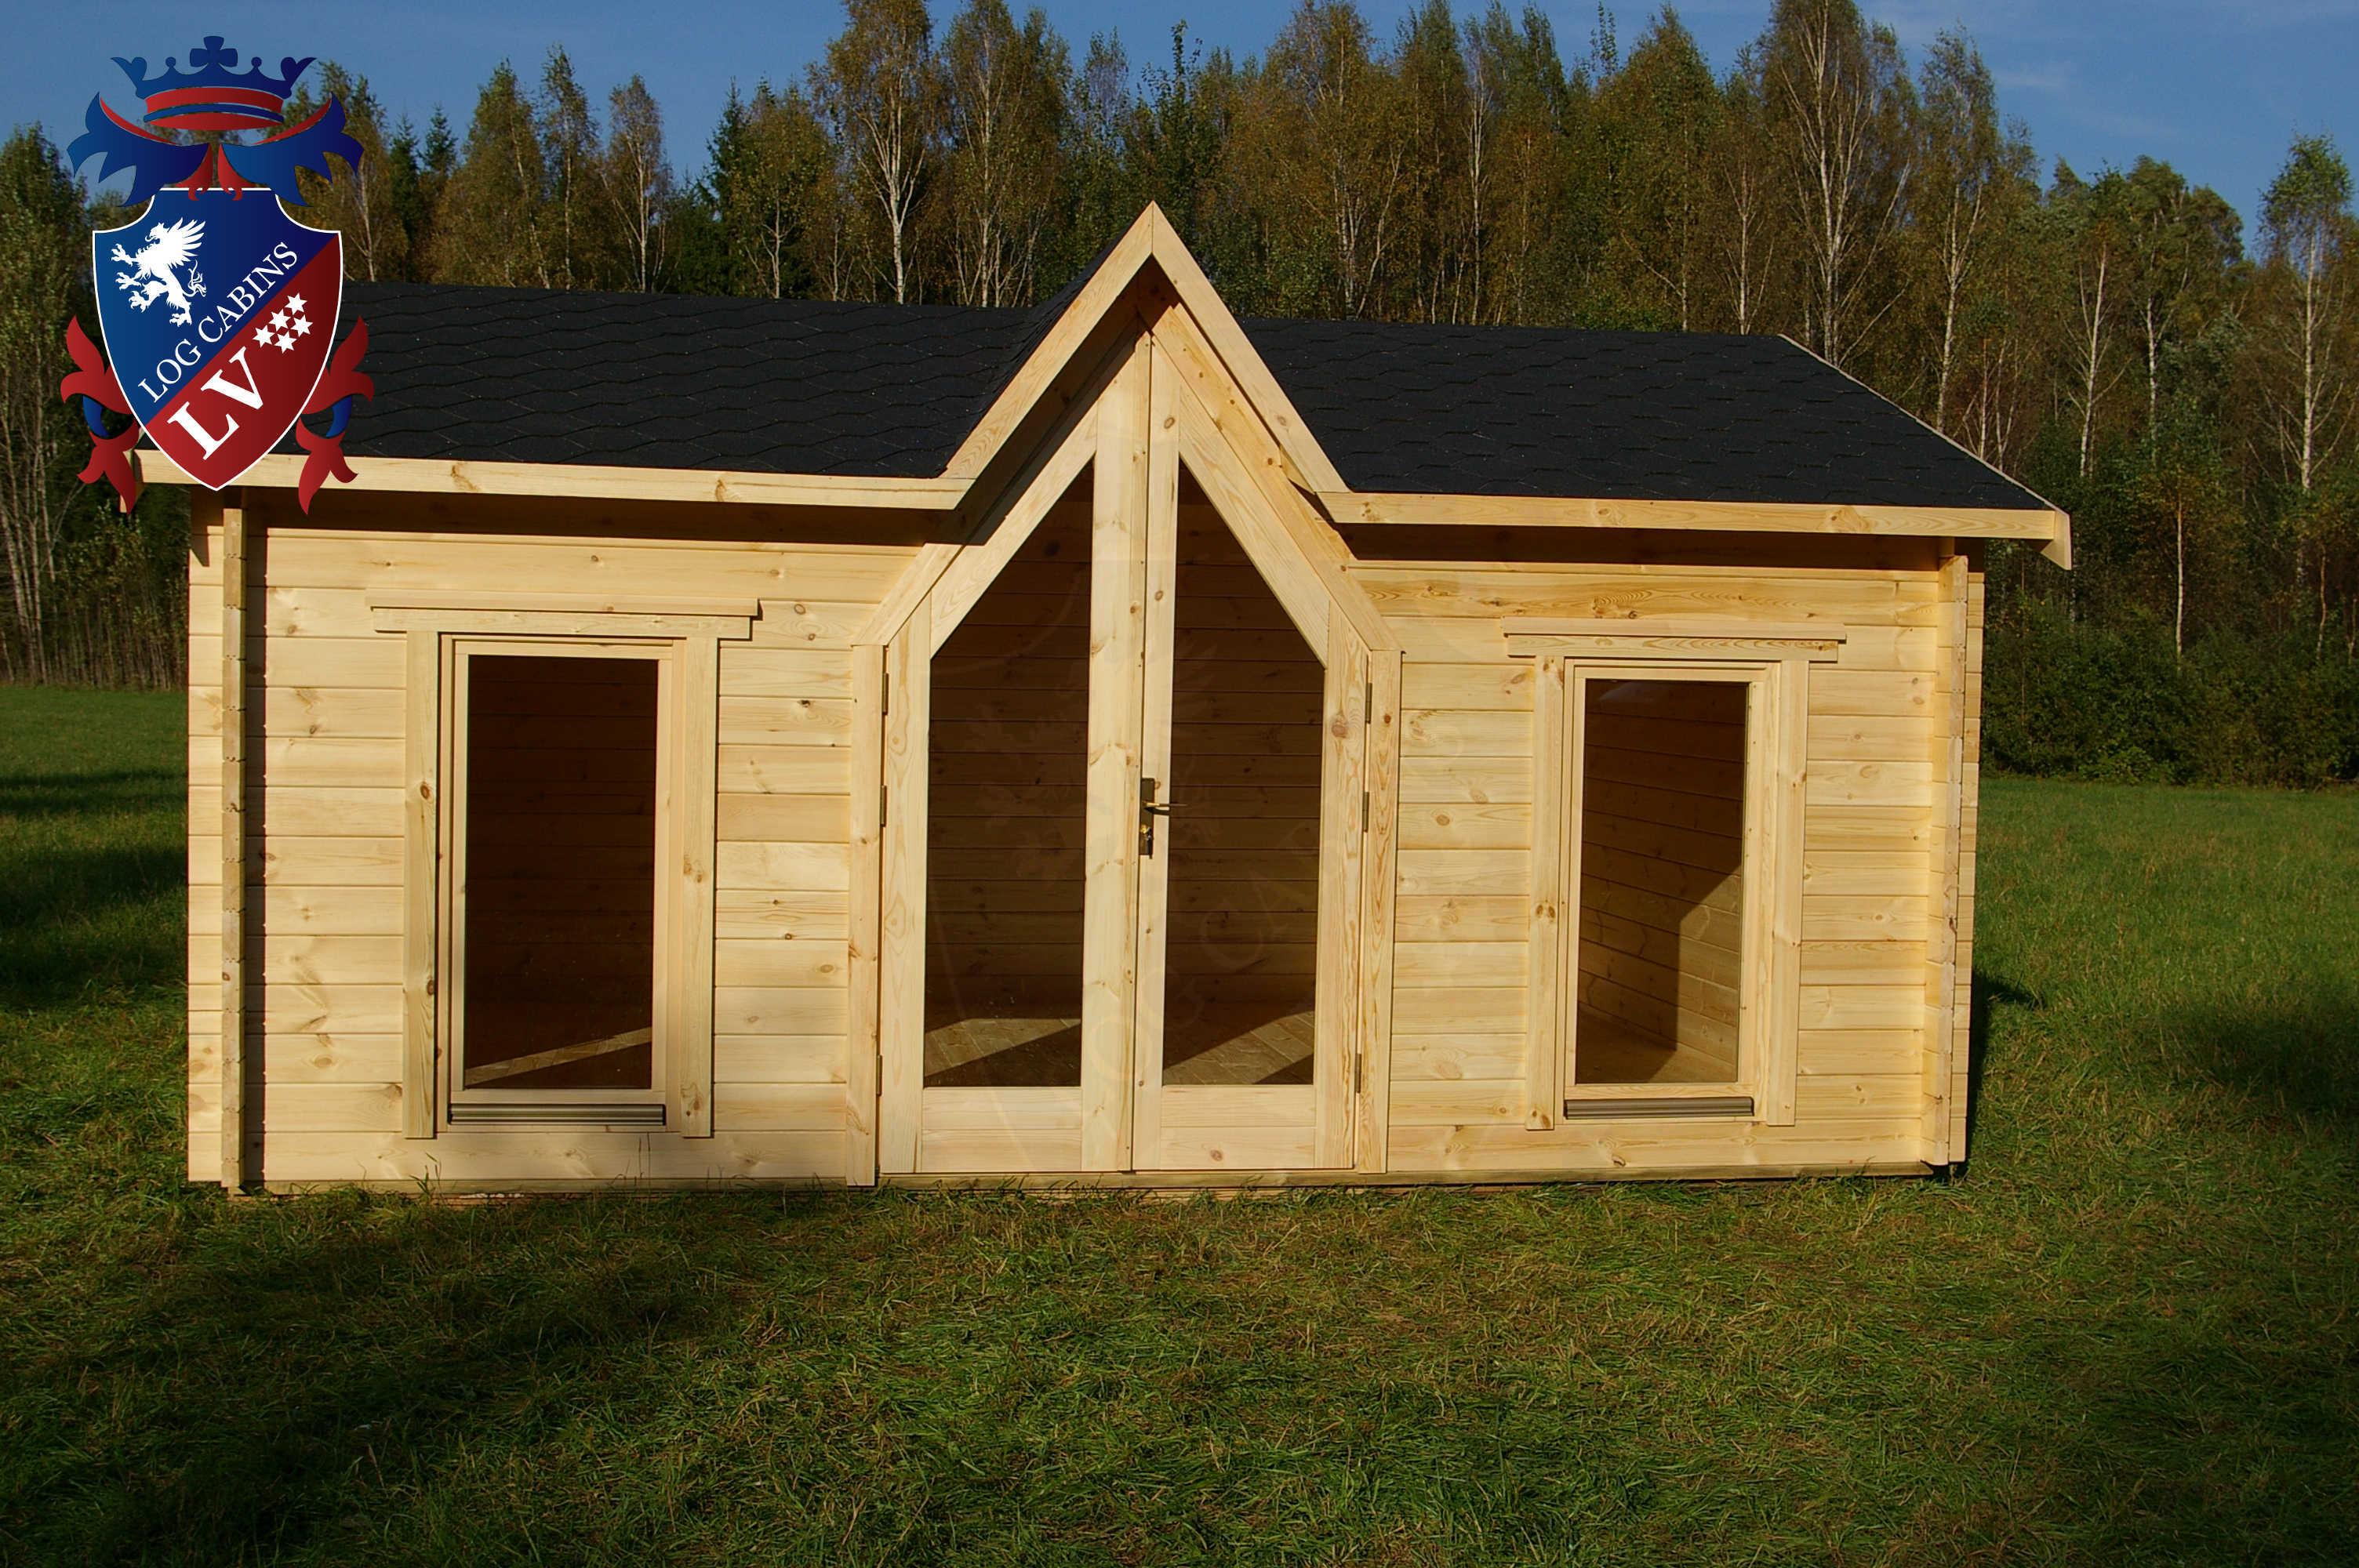 LV chapel log cabin